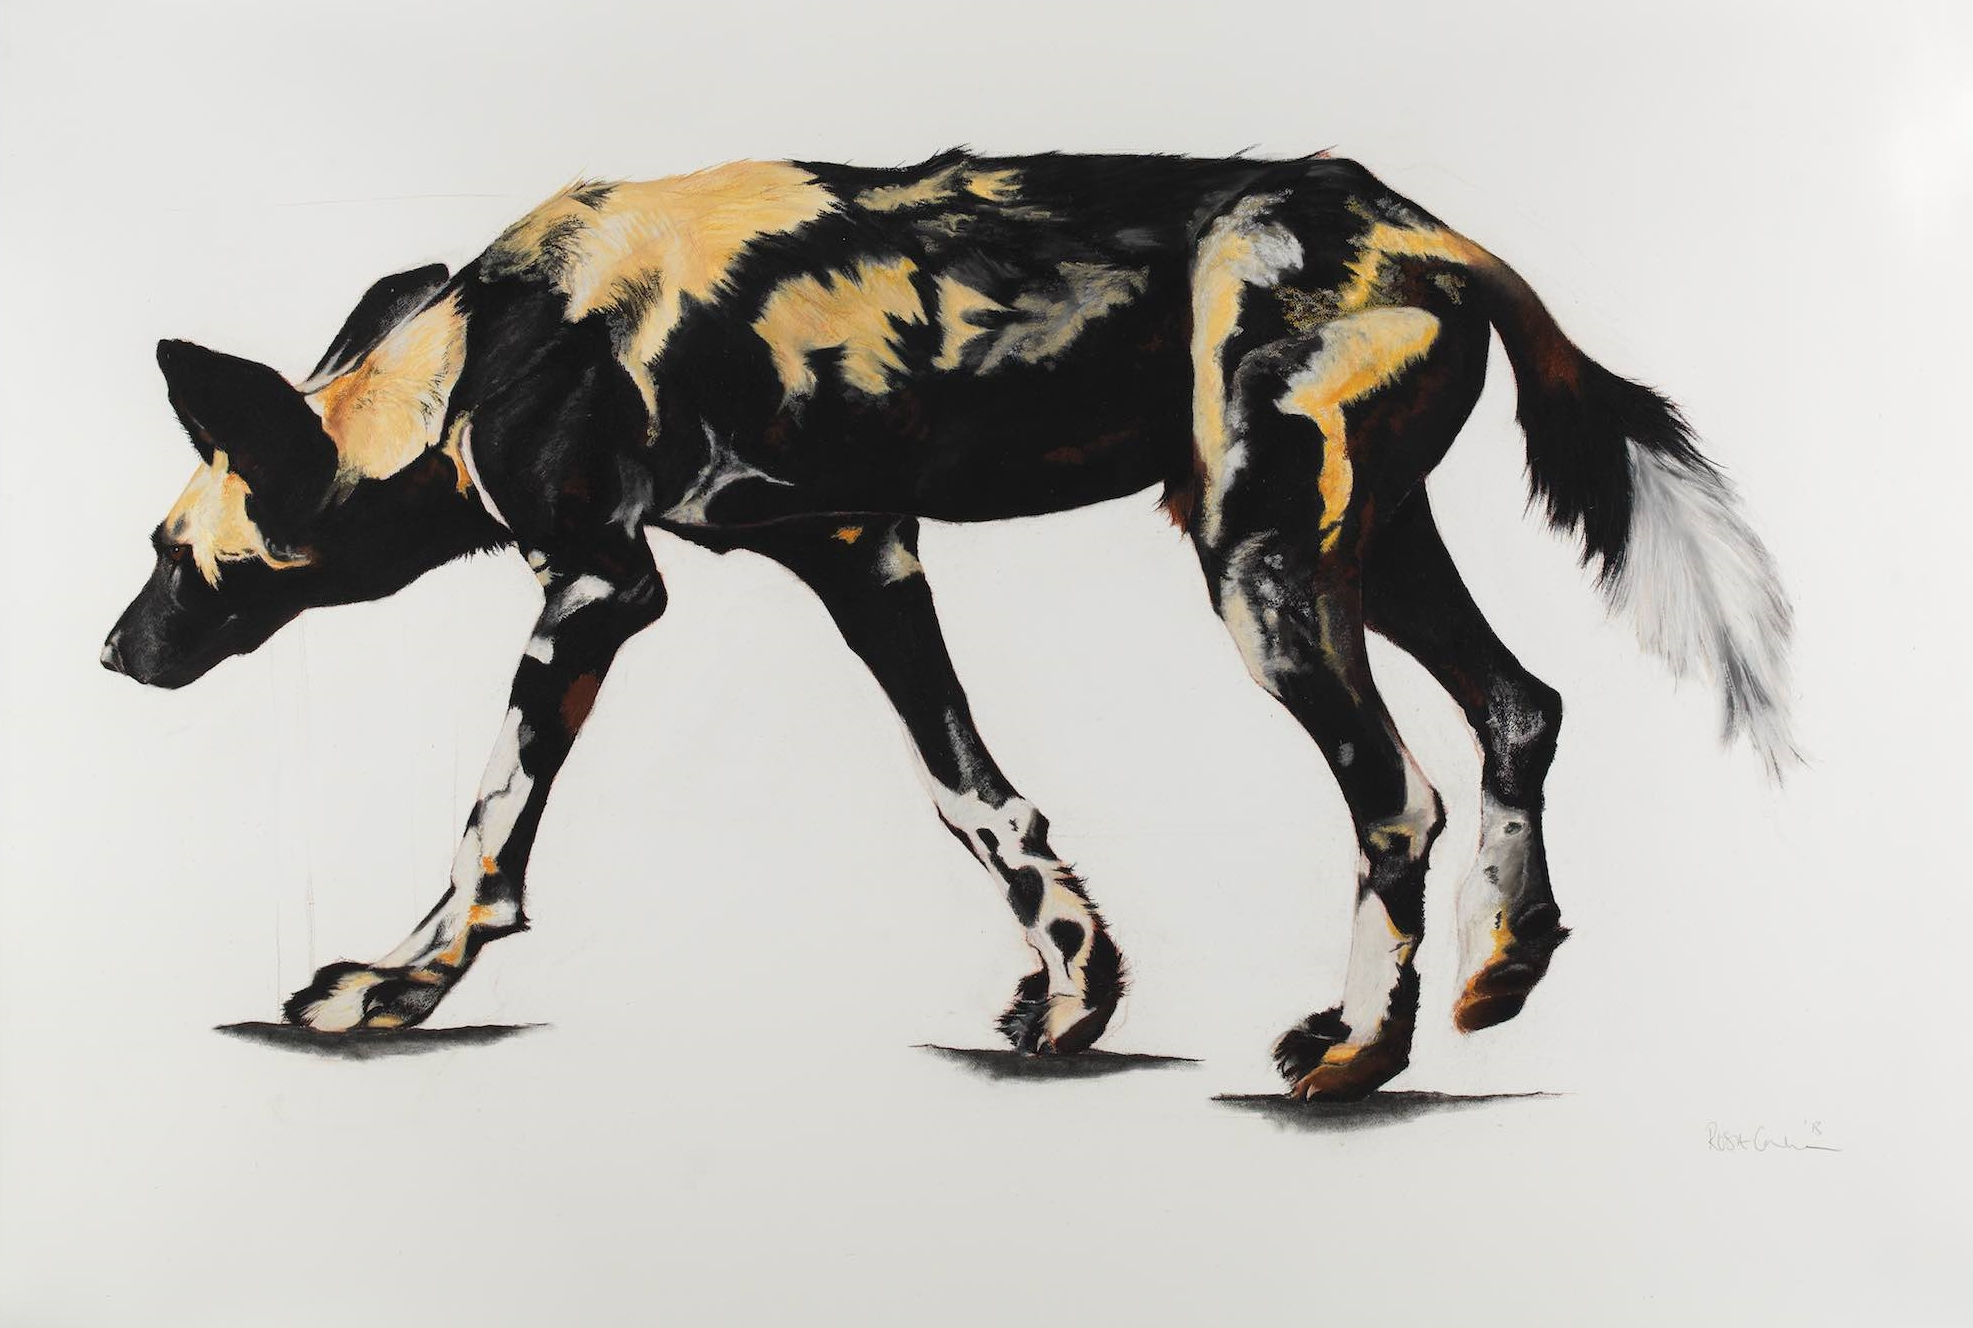 20. LARGE AFRICAN WILD DOG II